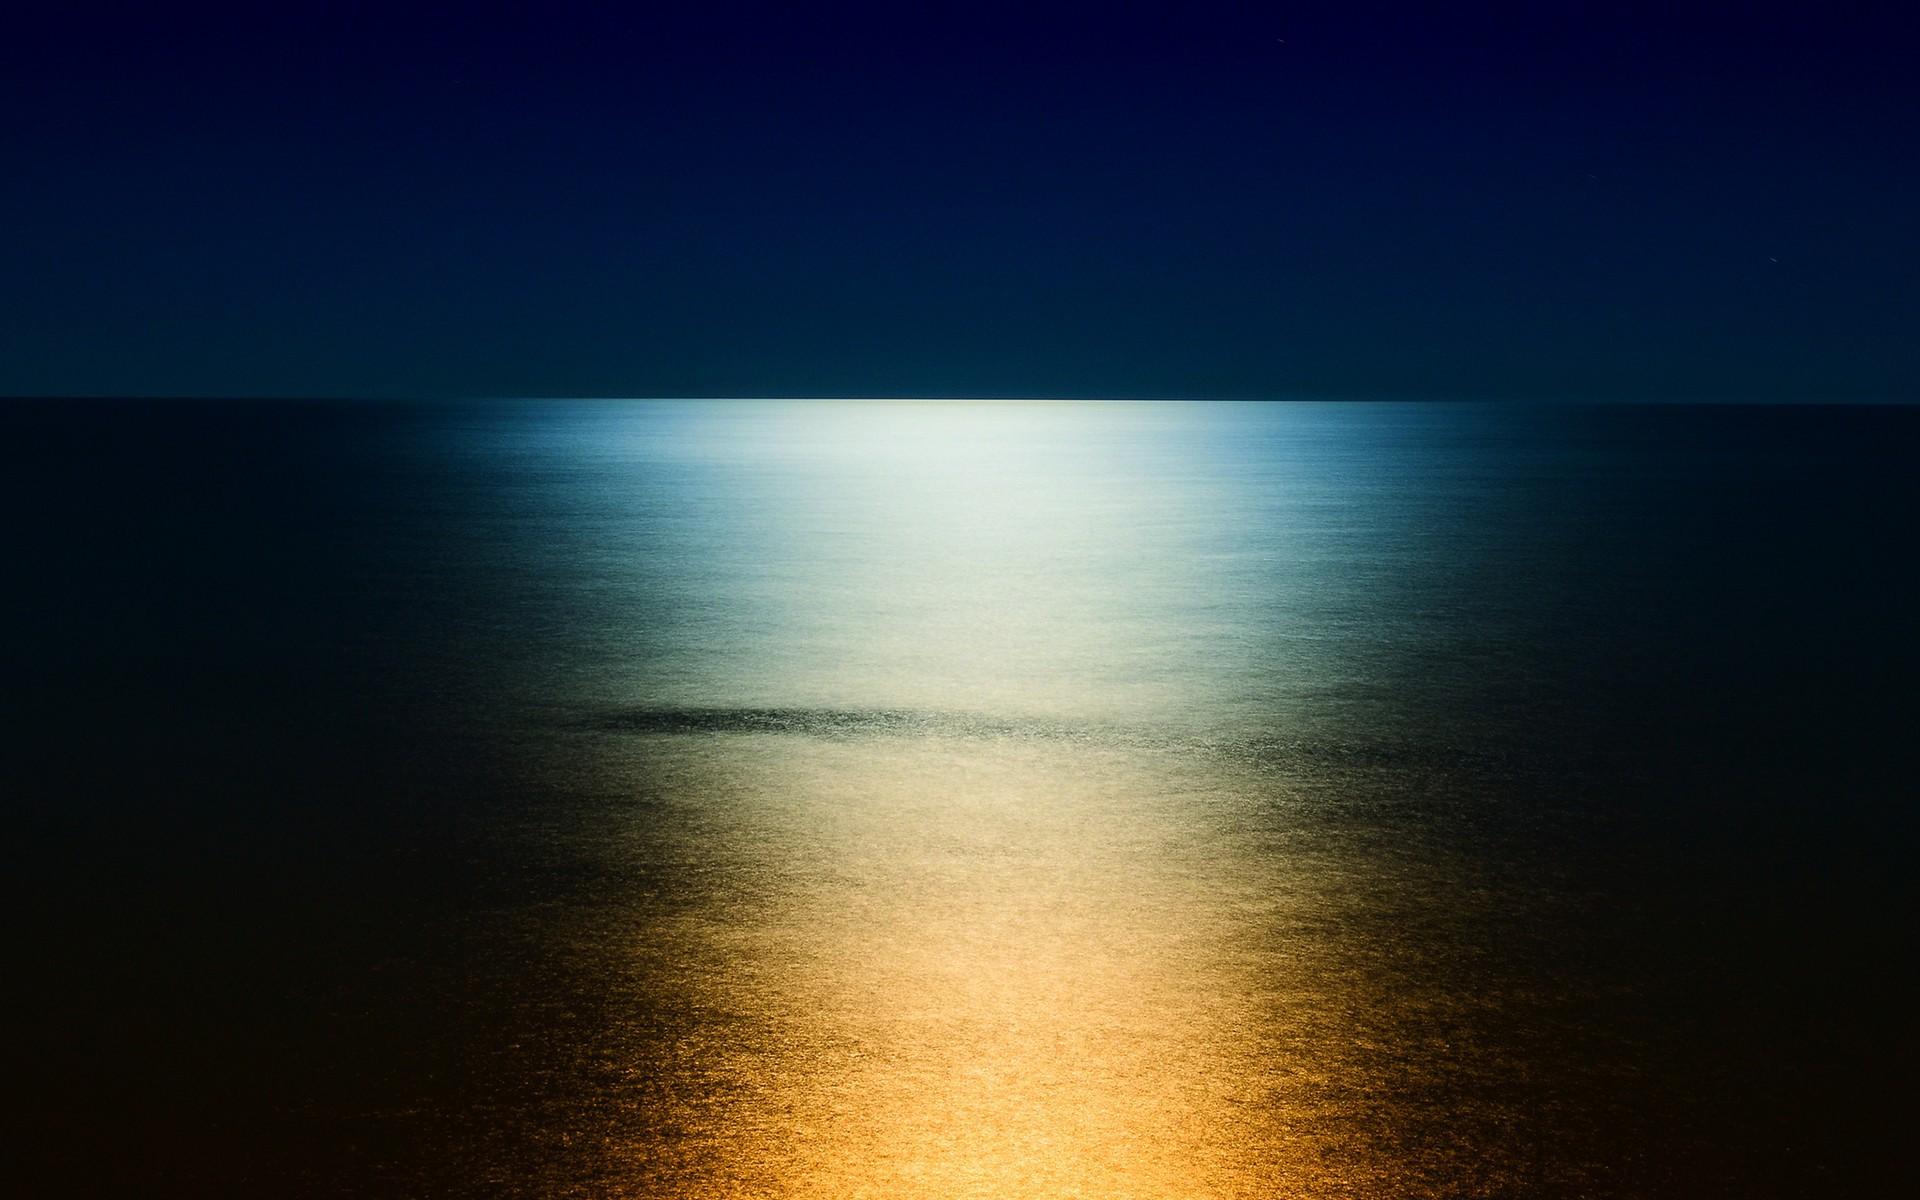 Луна море обои на рабочий стол